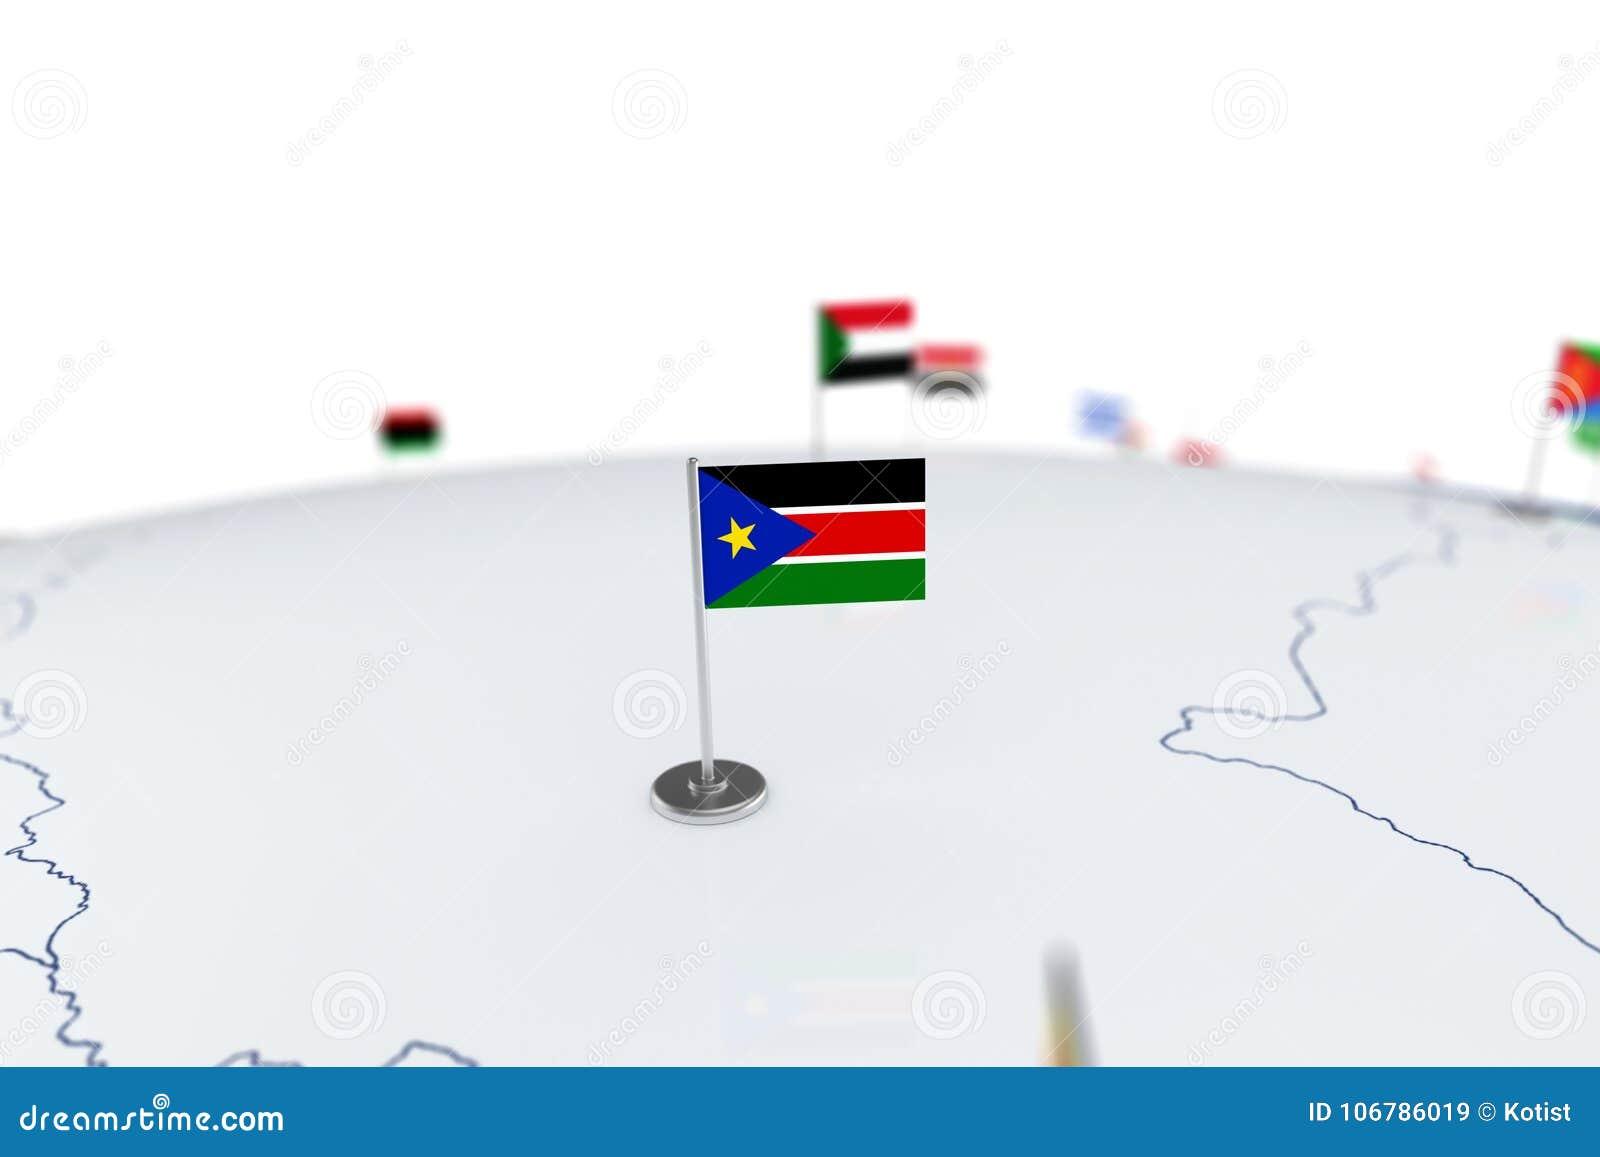 South sudan flag stock illustration illustration of nation 106786019 download south sudan flag stock illustration illustration of nation 106786019 gumiabroncs Choice Image